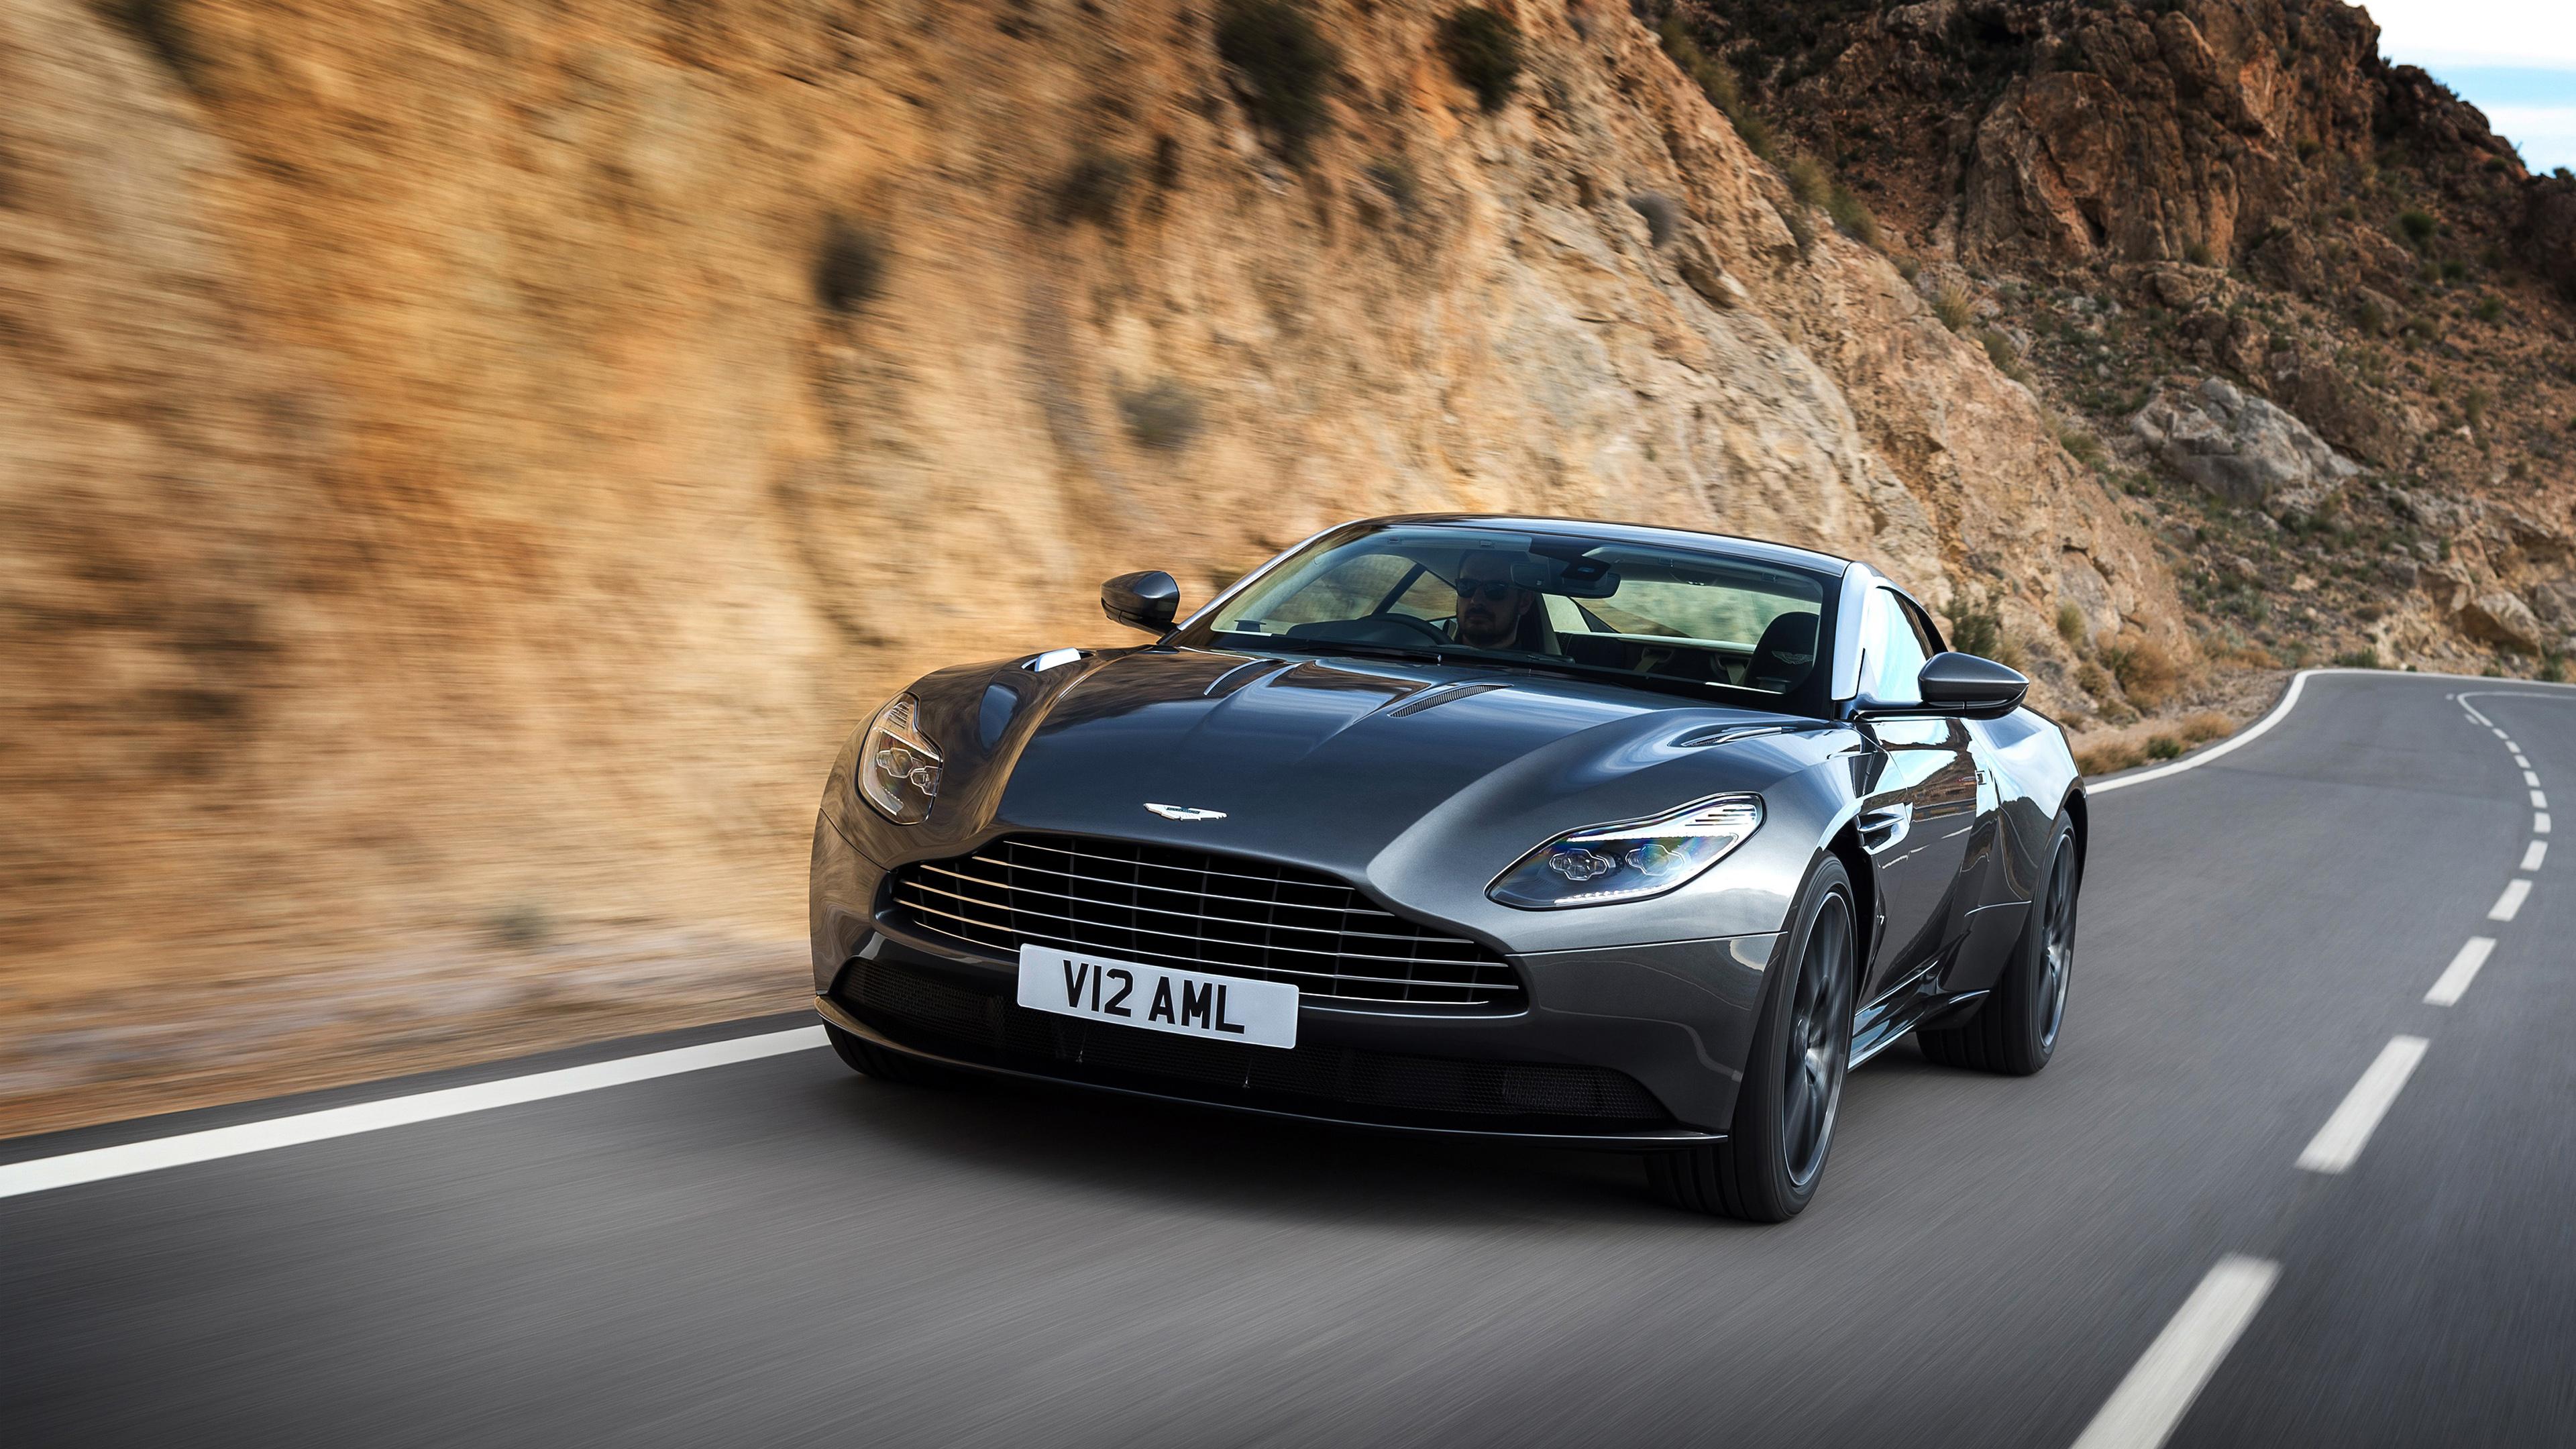 2017 Aston Martin Db11 Geneva Auto Wallpaper Hd Car Wallpapers